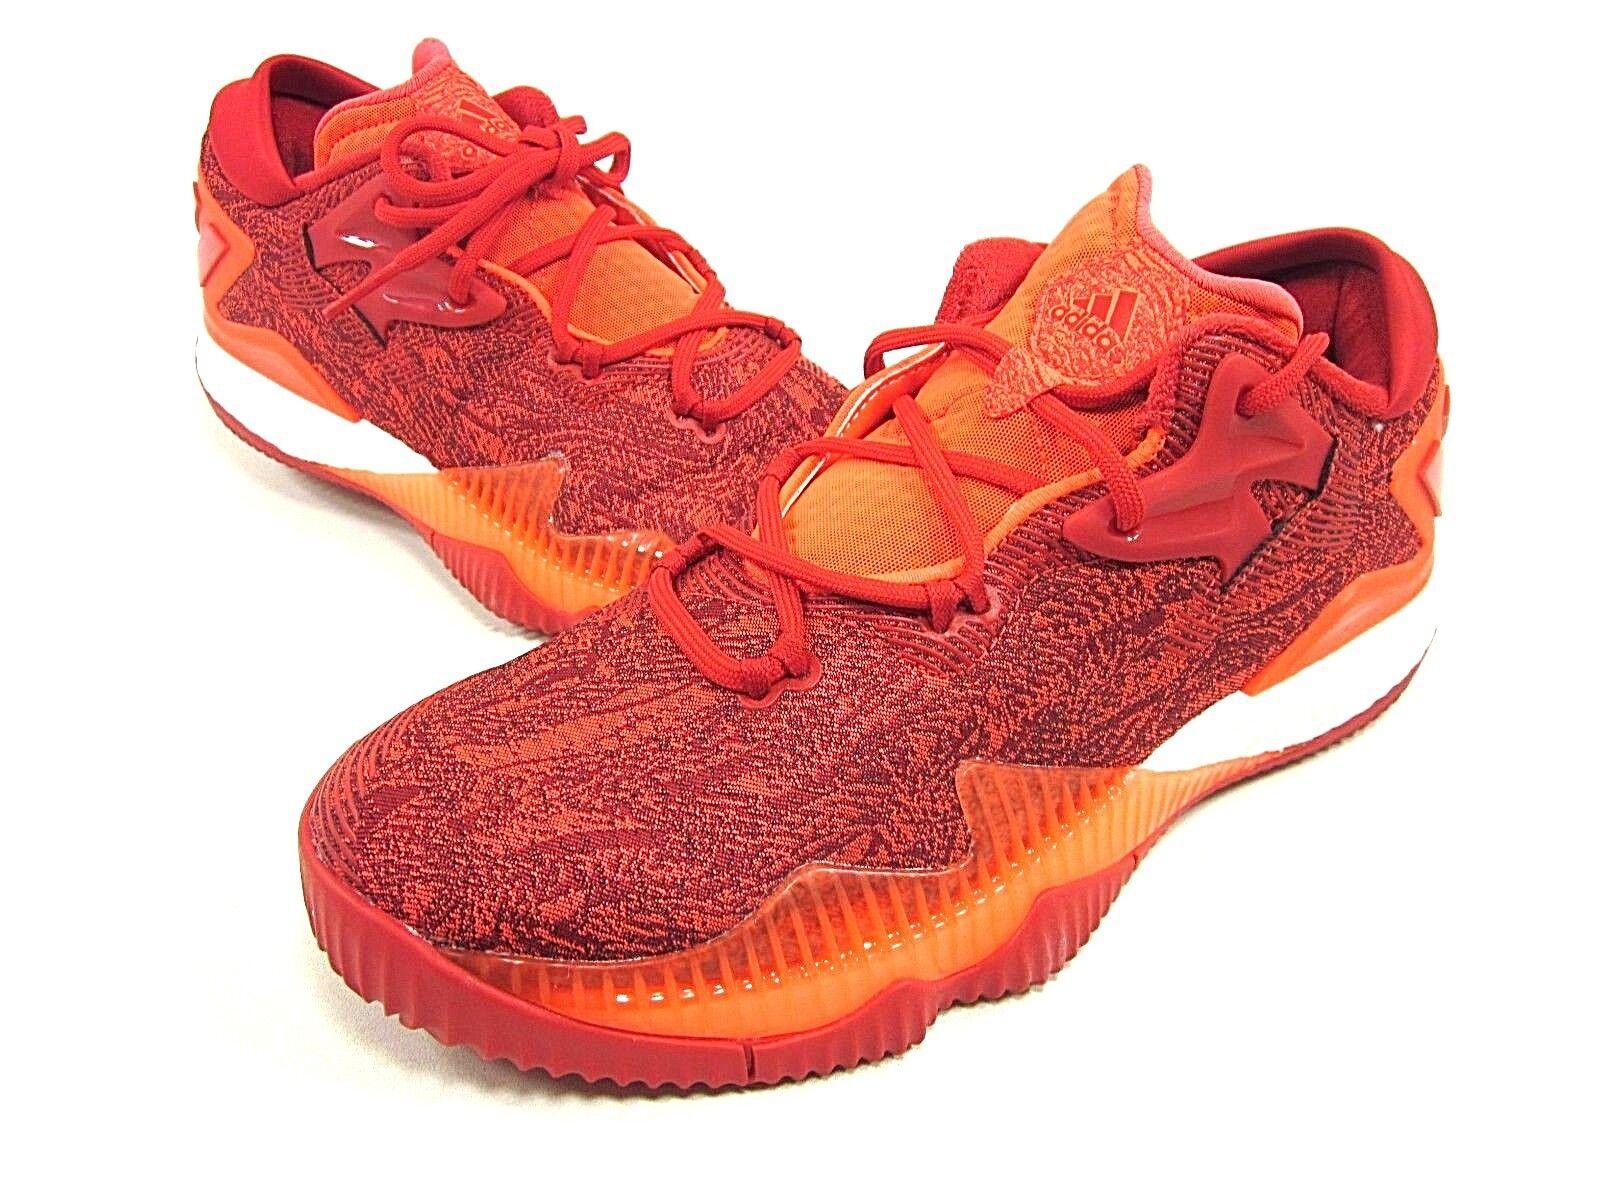 Adidas crazylight slancio da basso 2016 uomini scarpe da slancio basket 46, b42389 b29d72